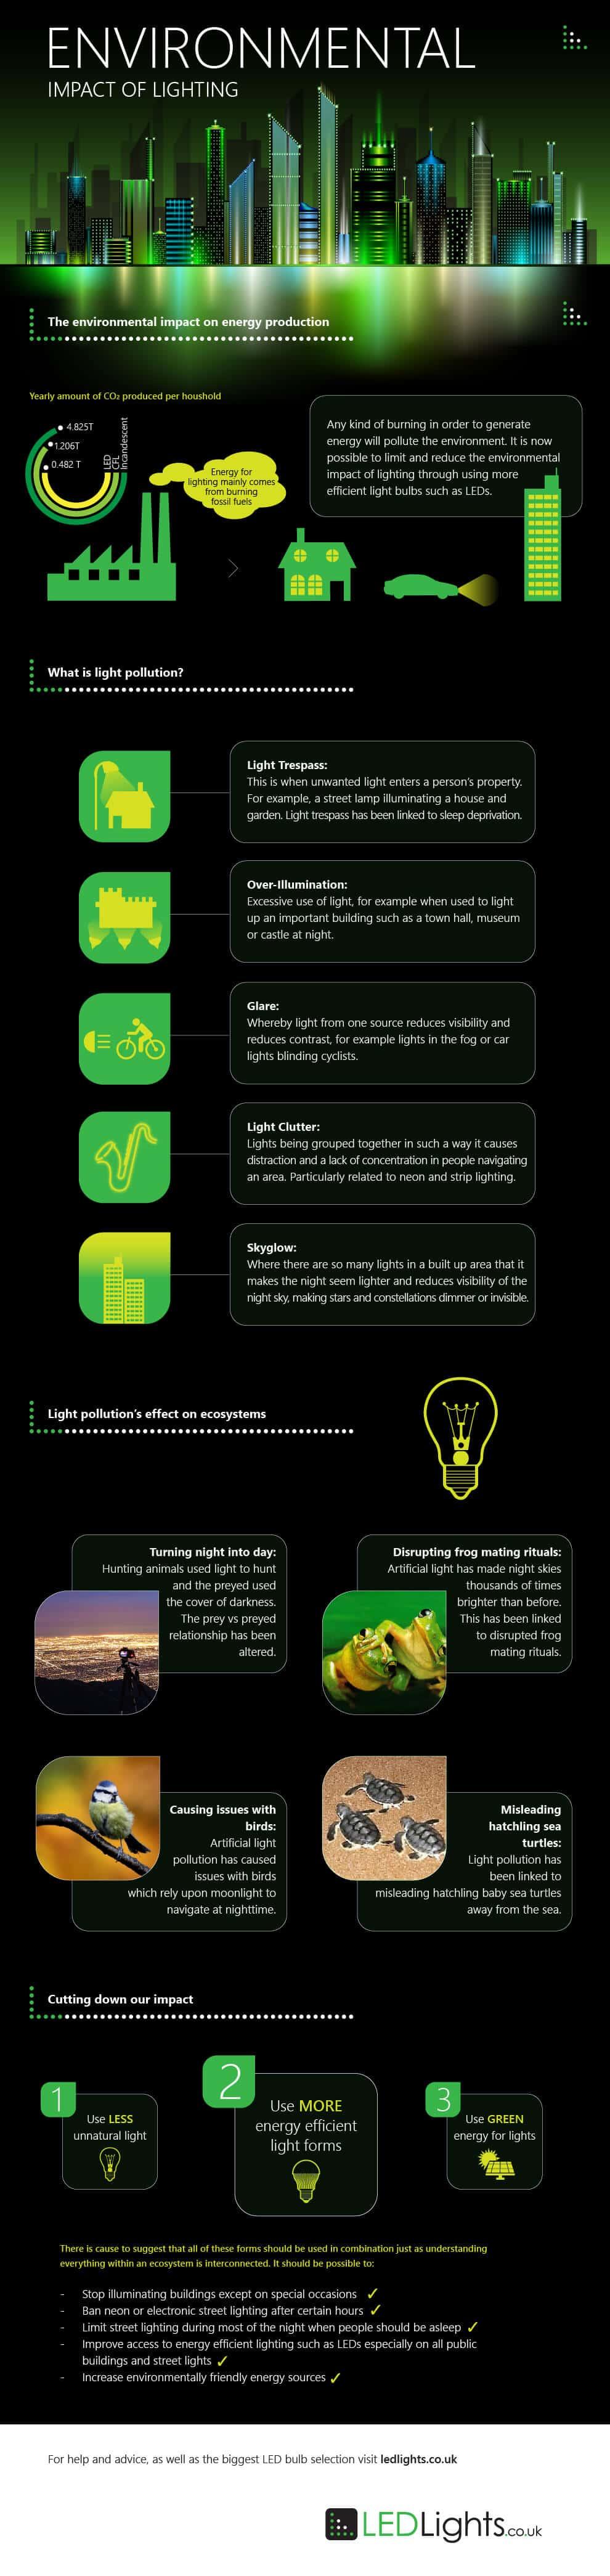 Environmental-Impact-LEDs-Infographic[1]